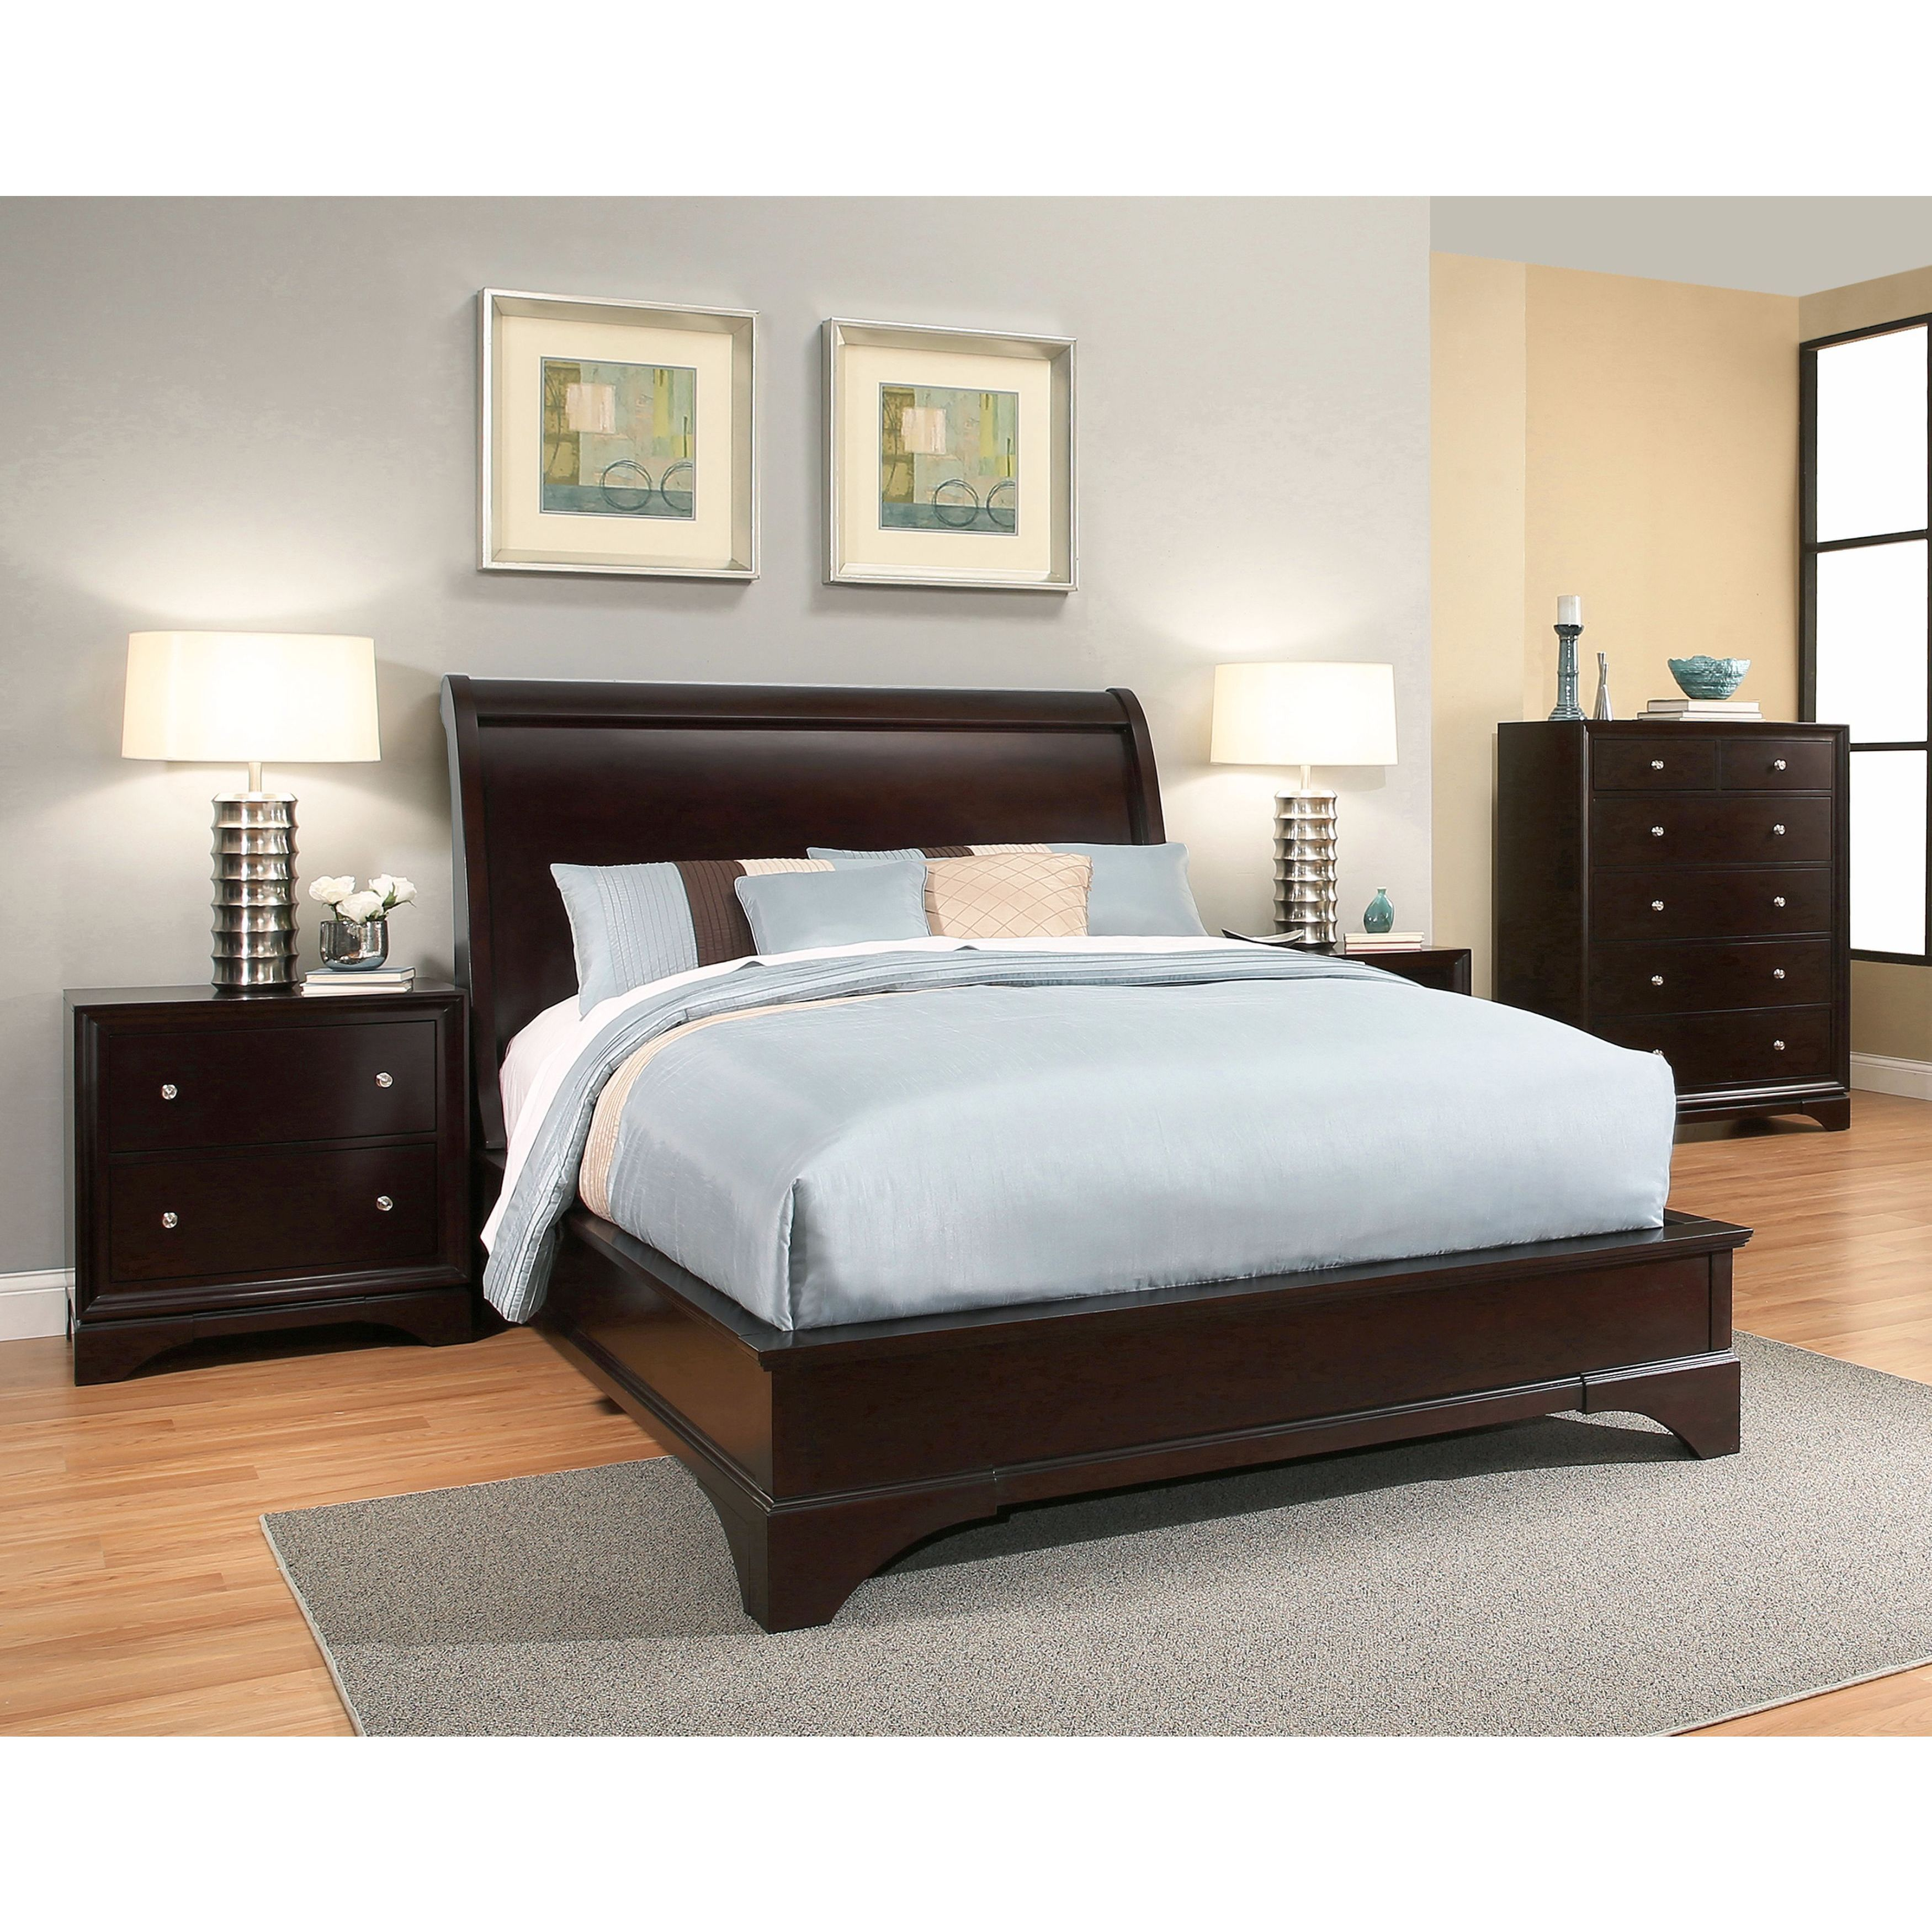 Abbyson Sydney Espresso Finish Wood Bed California King Brown